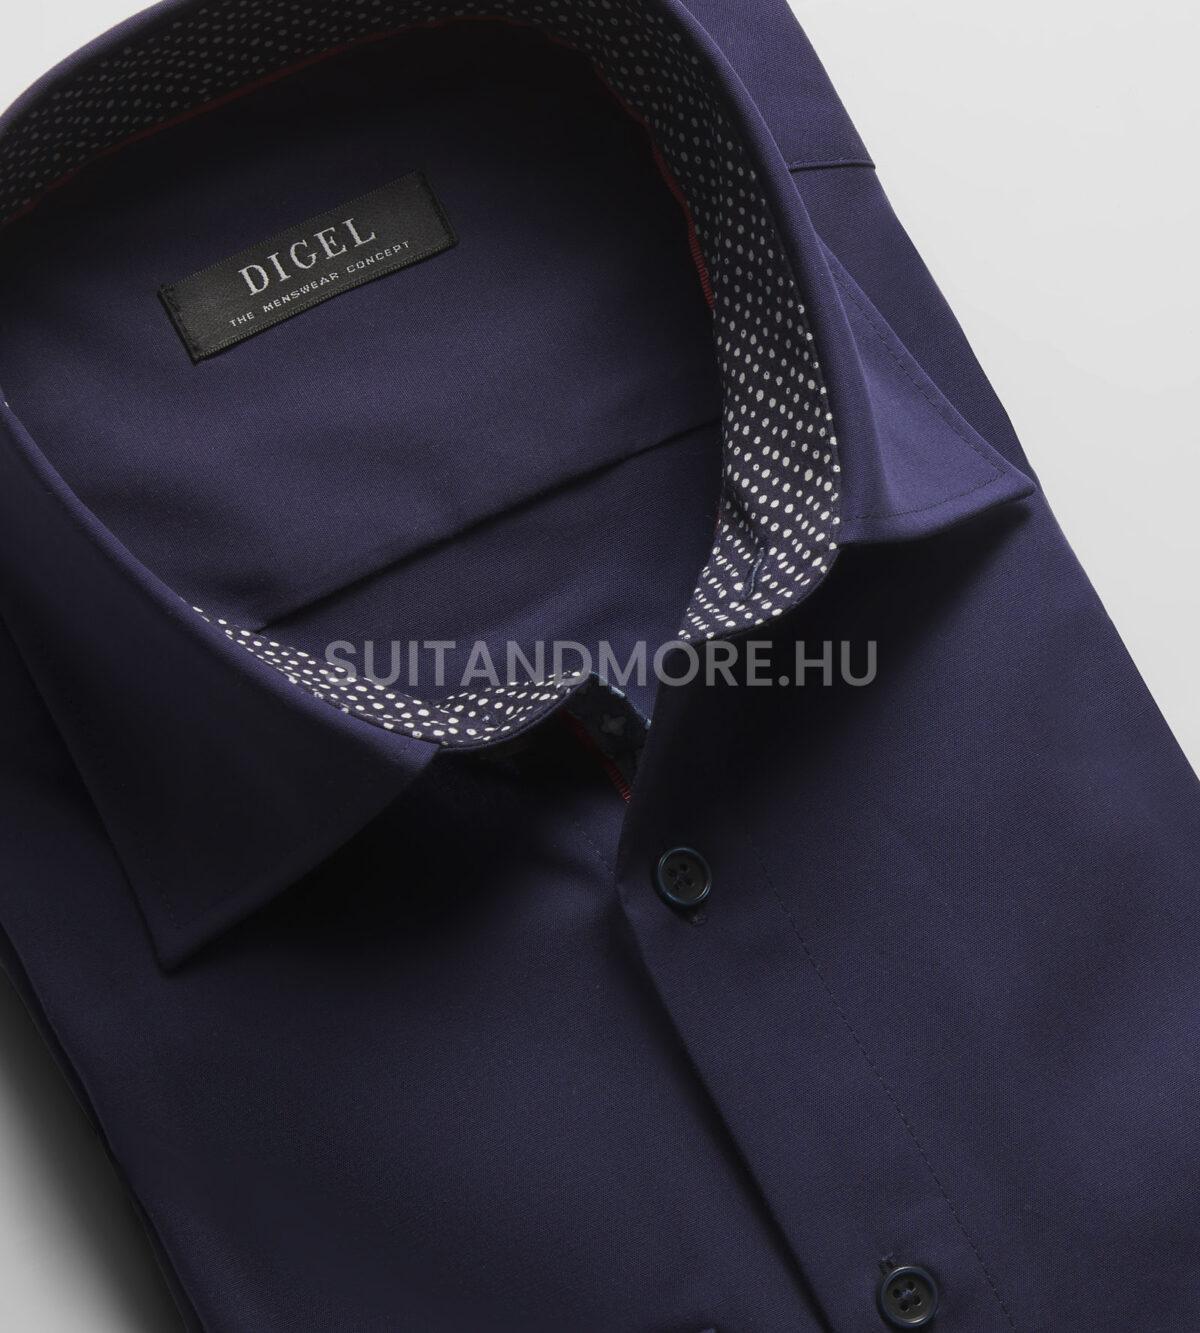 DIGEL-kék-modern-fit-ing-B1-1-1267009-20-02